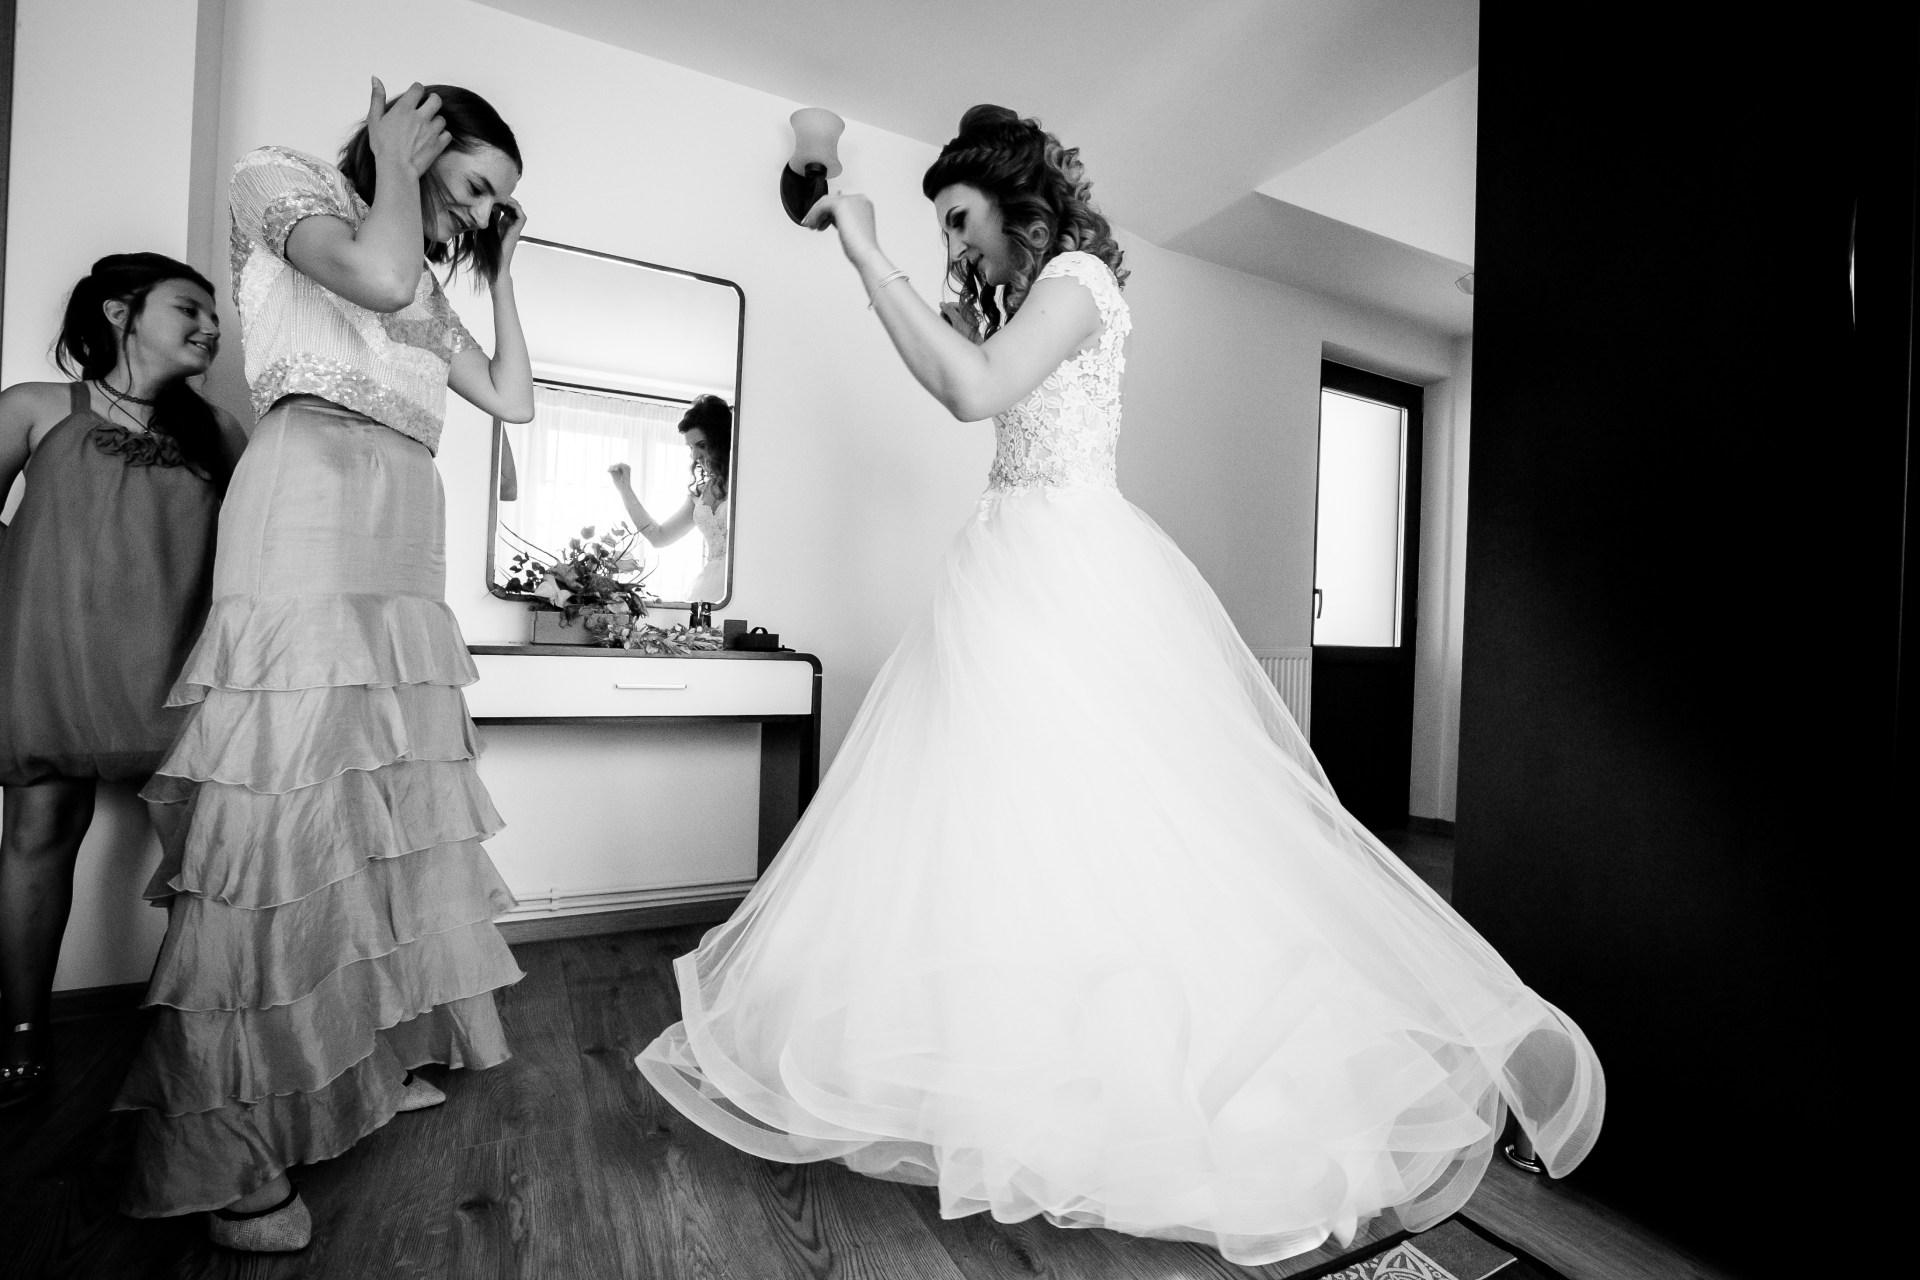 Alexandra si Vlad nunta Pleiada Iasi - pregatiri mireasa - fotograf profesionist nunta www.paulpadurariu.ro © 2017 Paul Padurariu